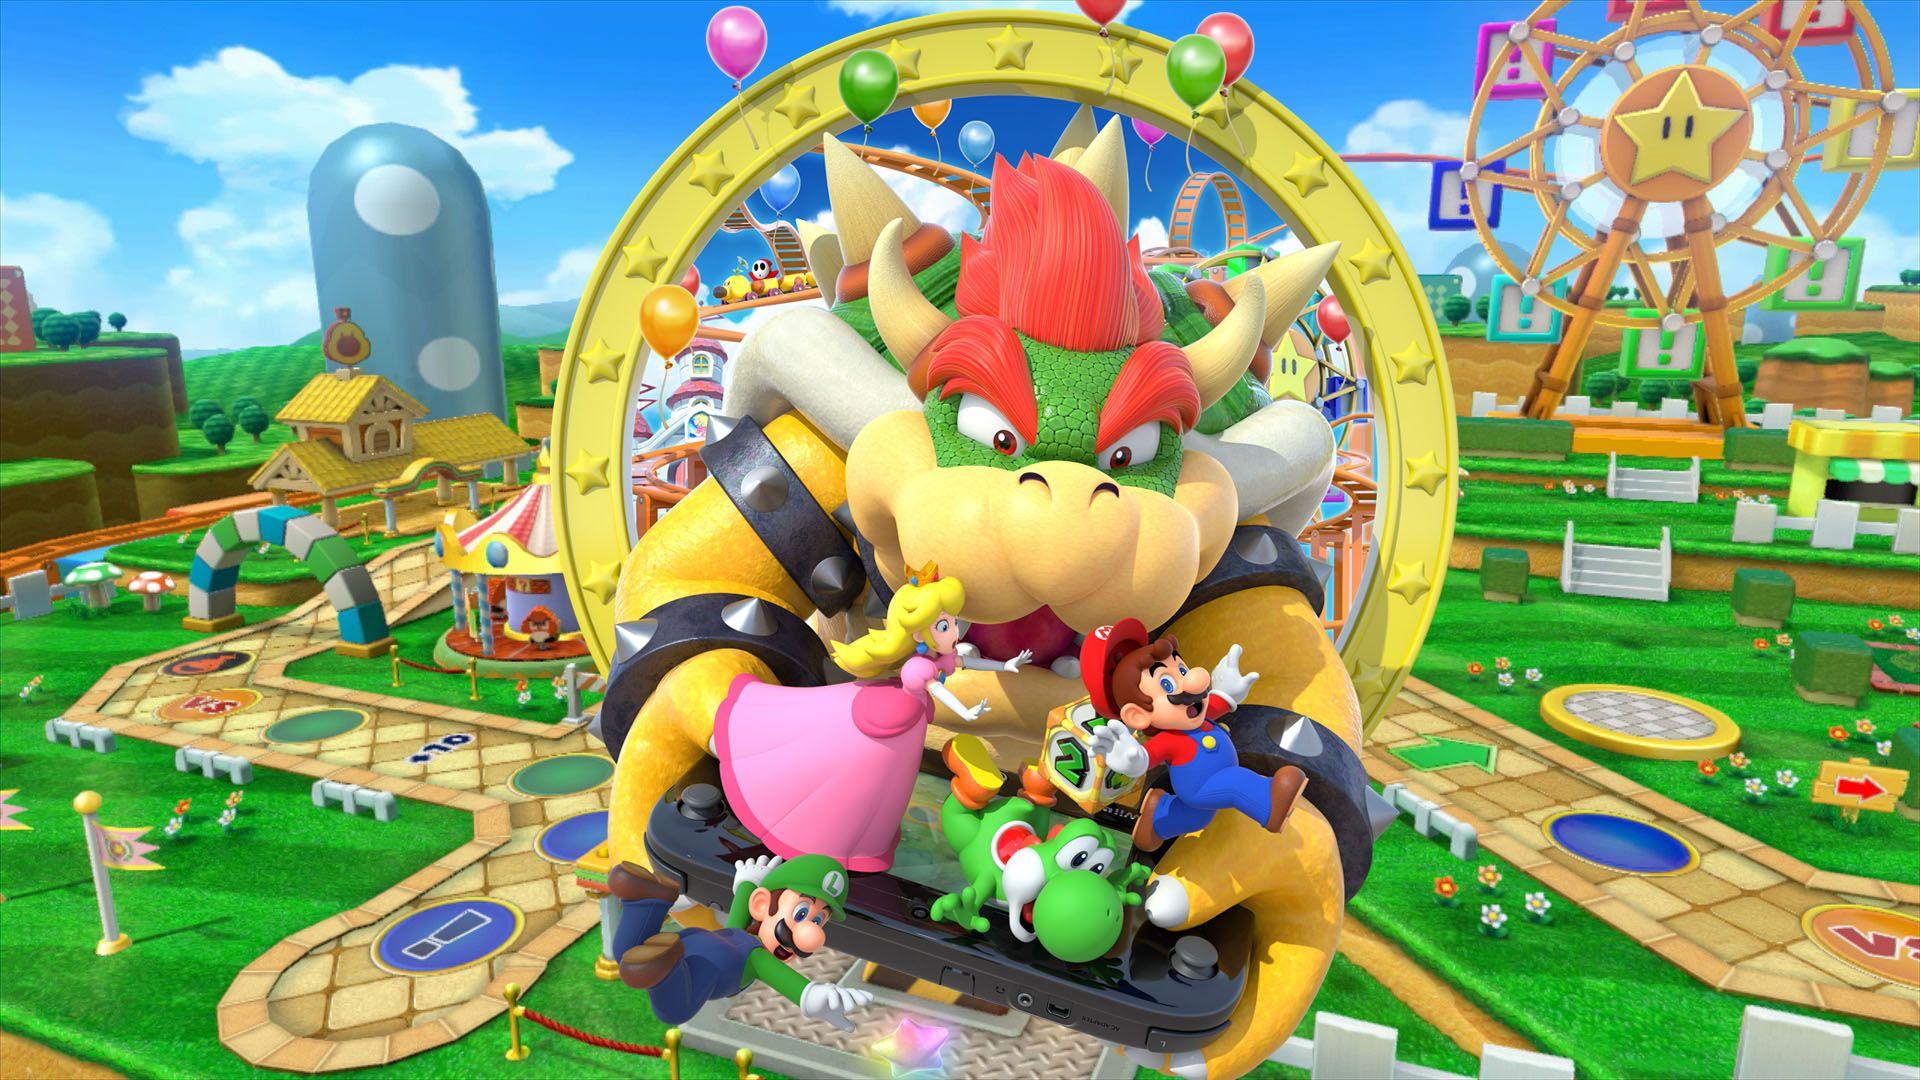 Mario Party 10 Wii U My Nintendo S Video Games Pinterest